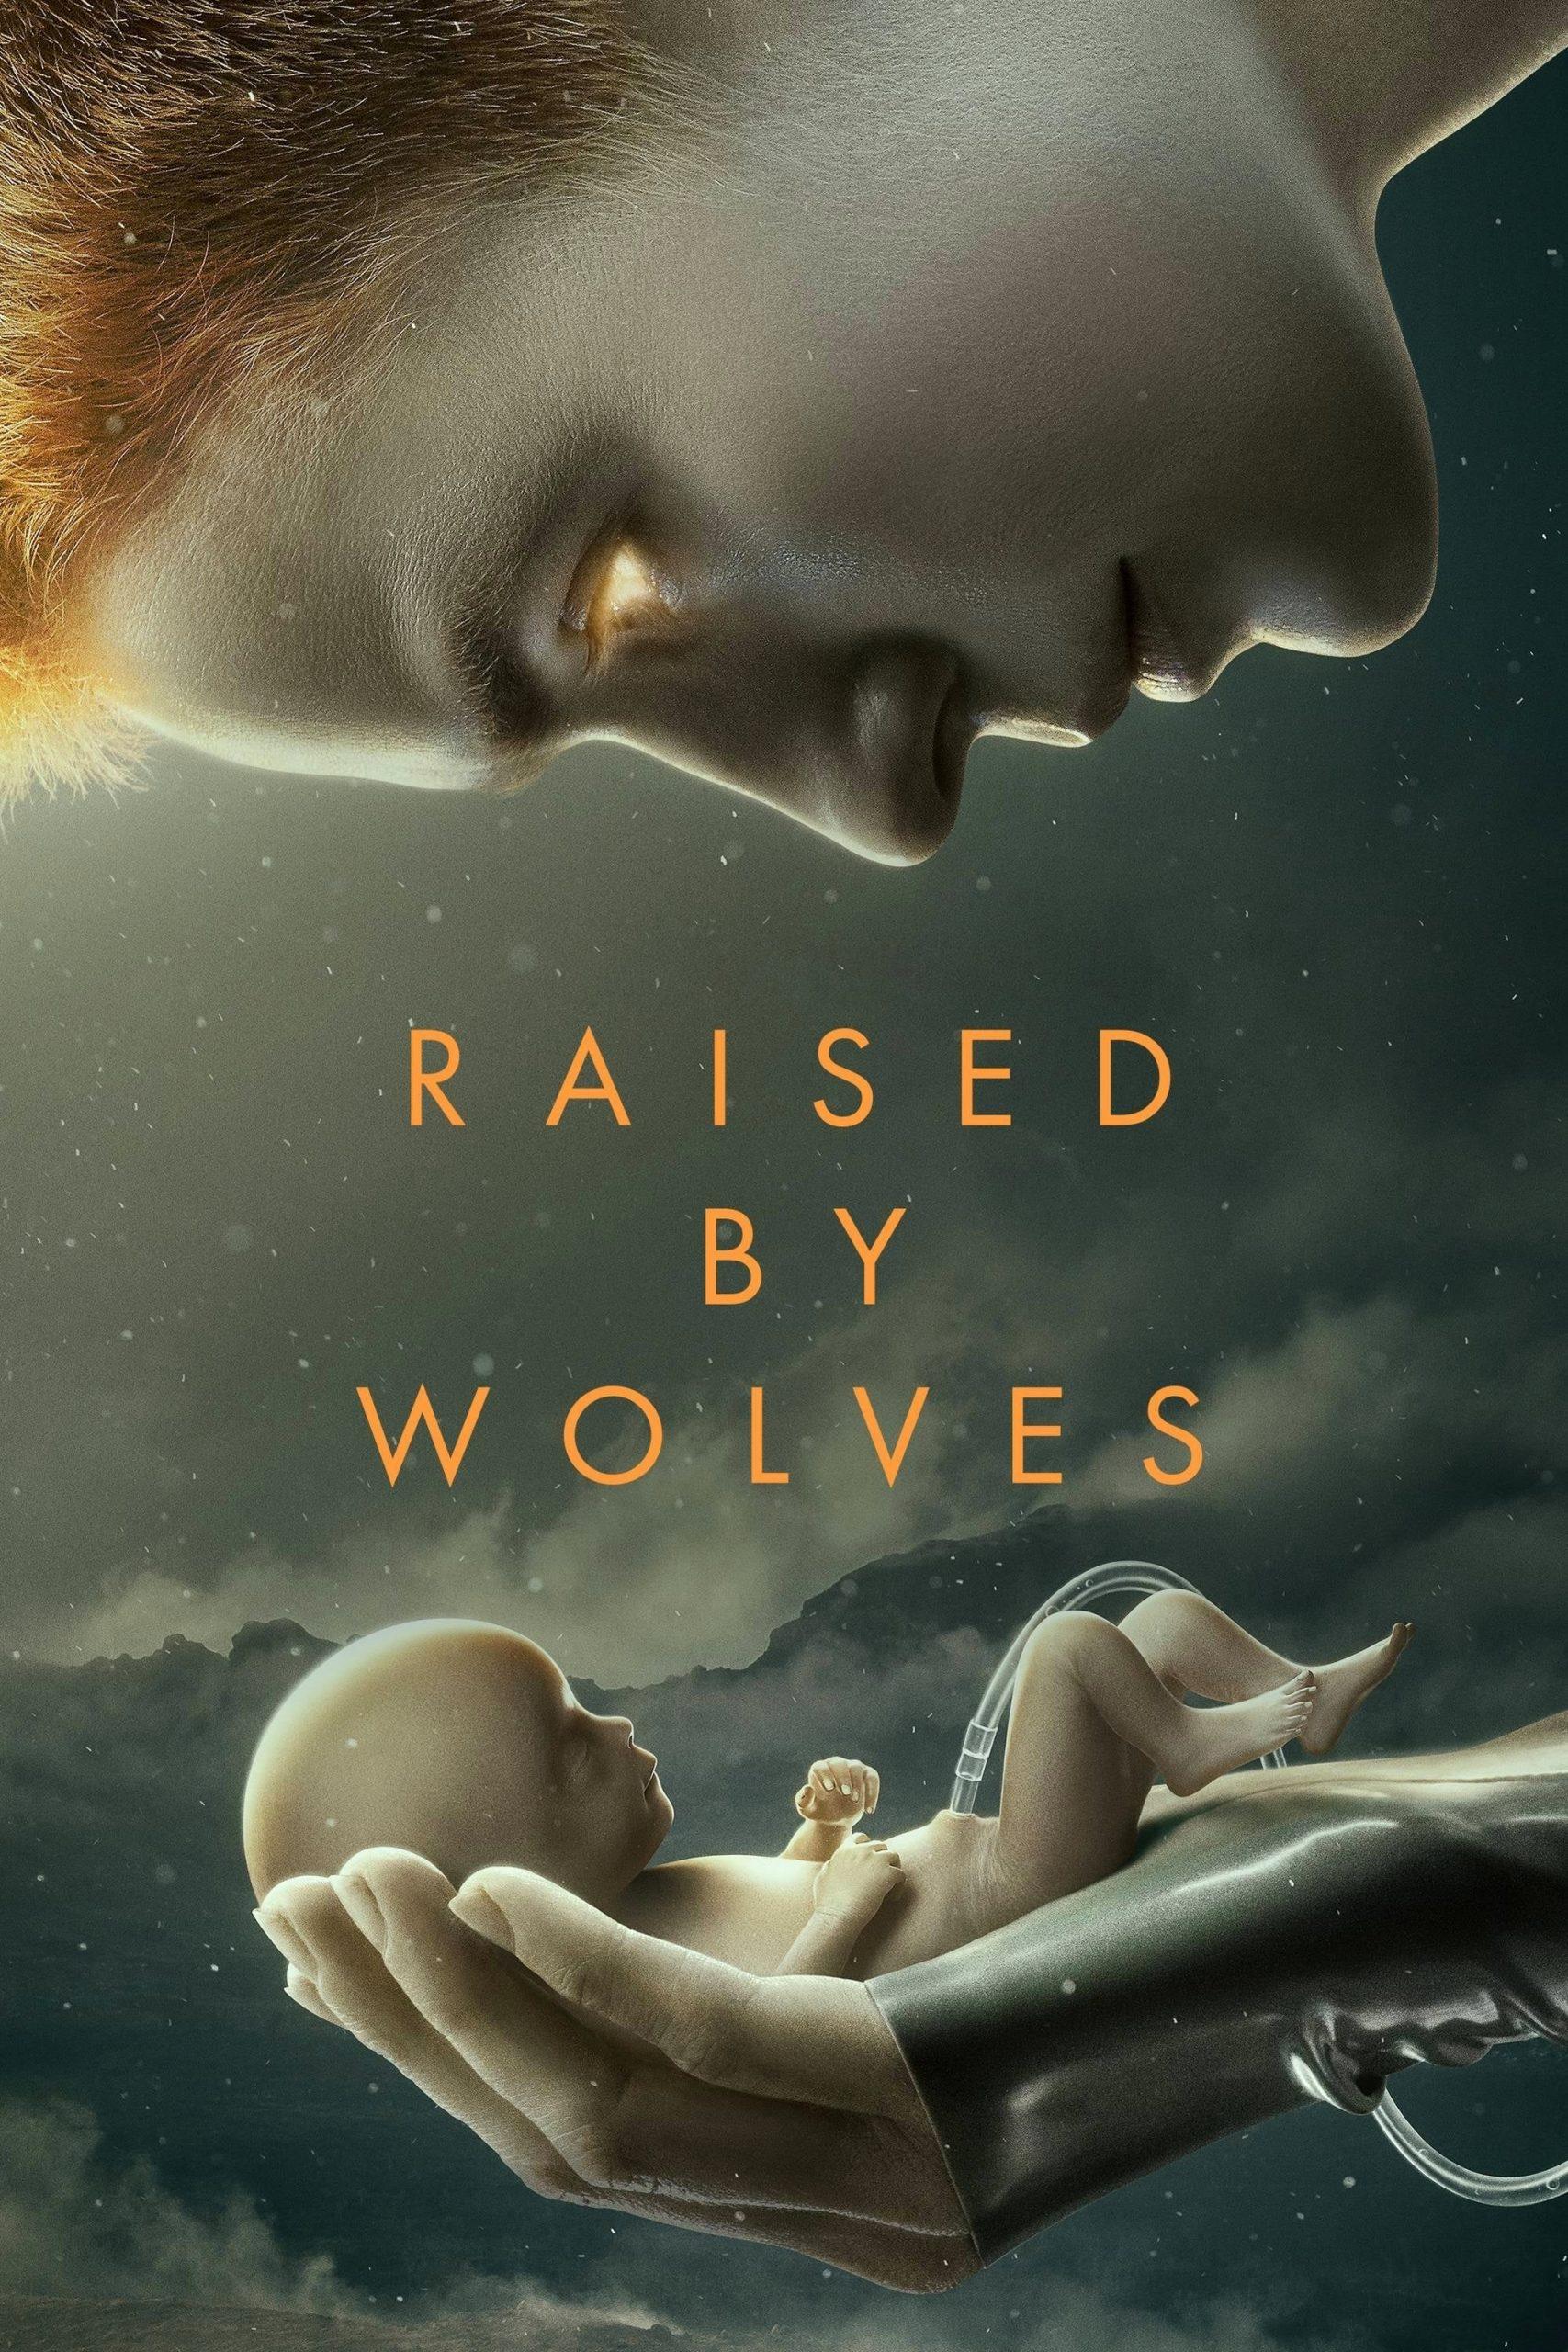 دانلود سریالRaised by Wolves با دوبله فارسی